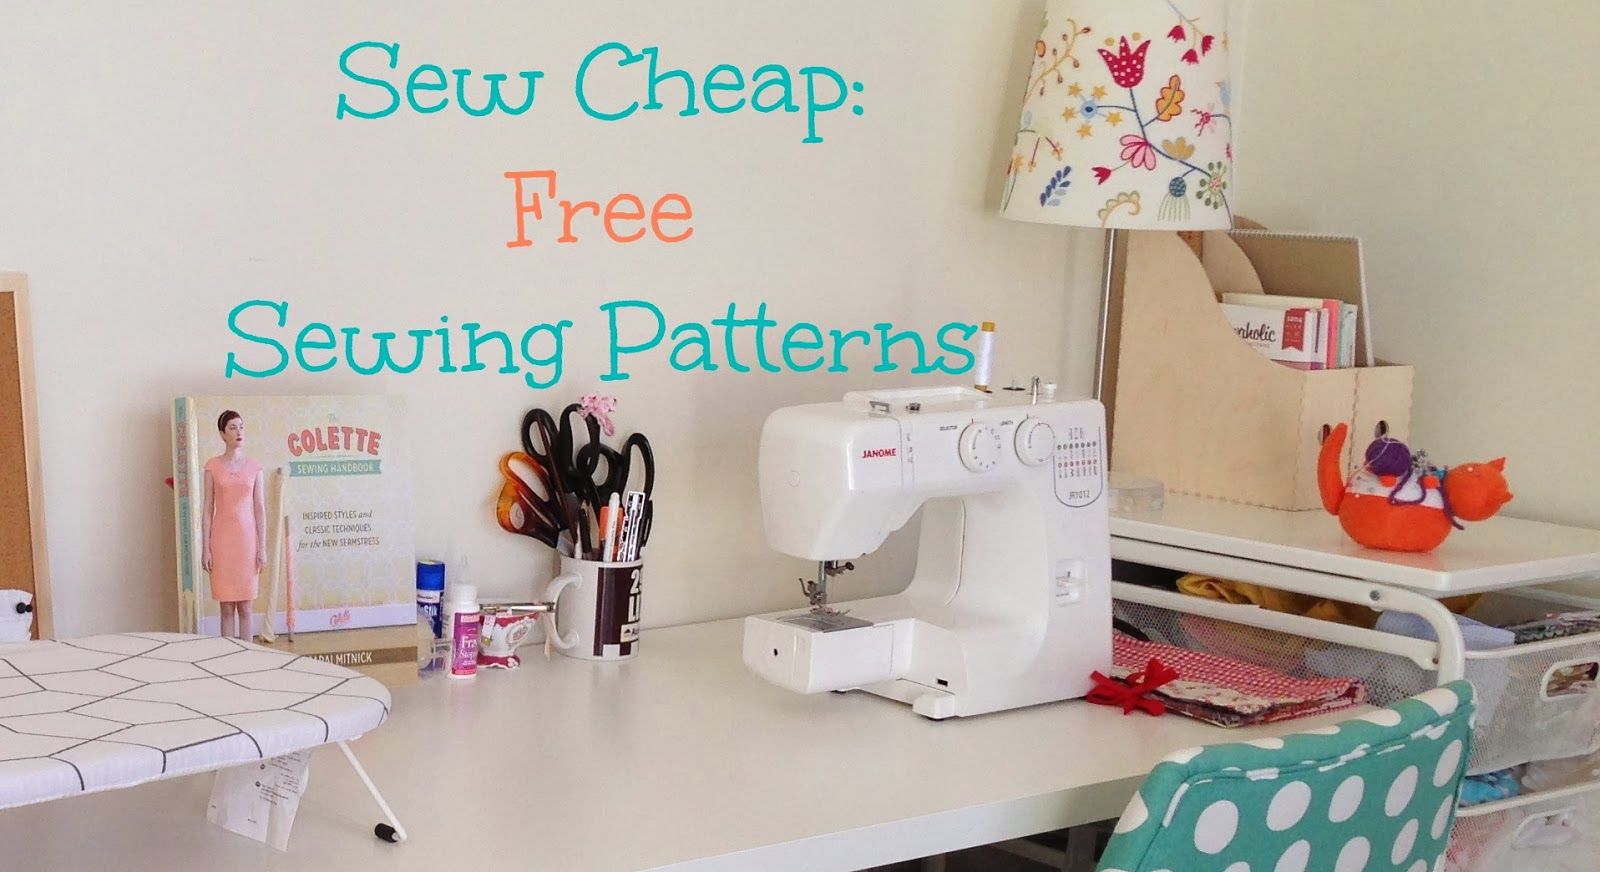 Sew Cheap: Free Sewing Patterns